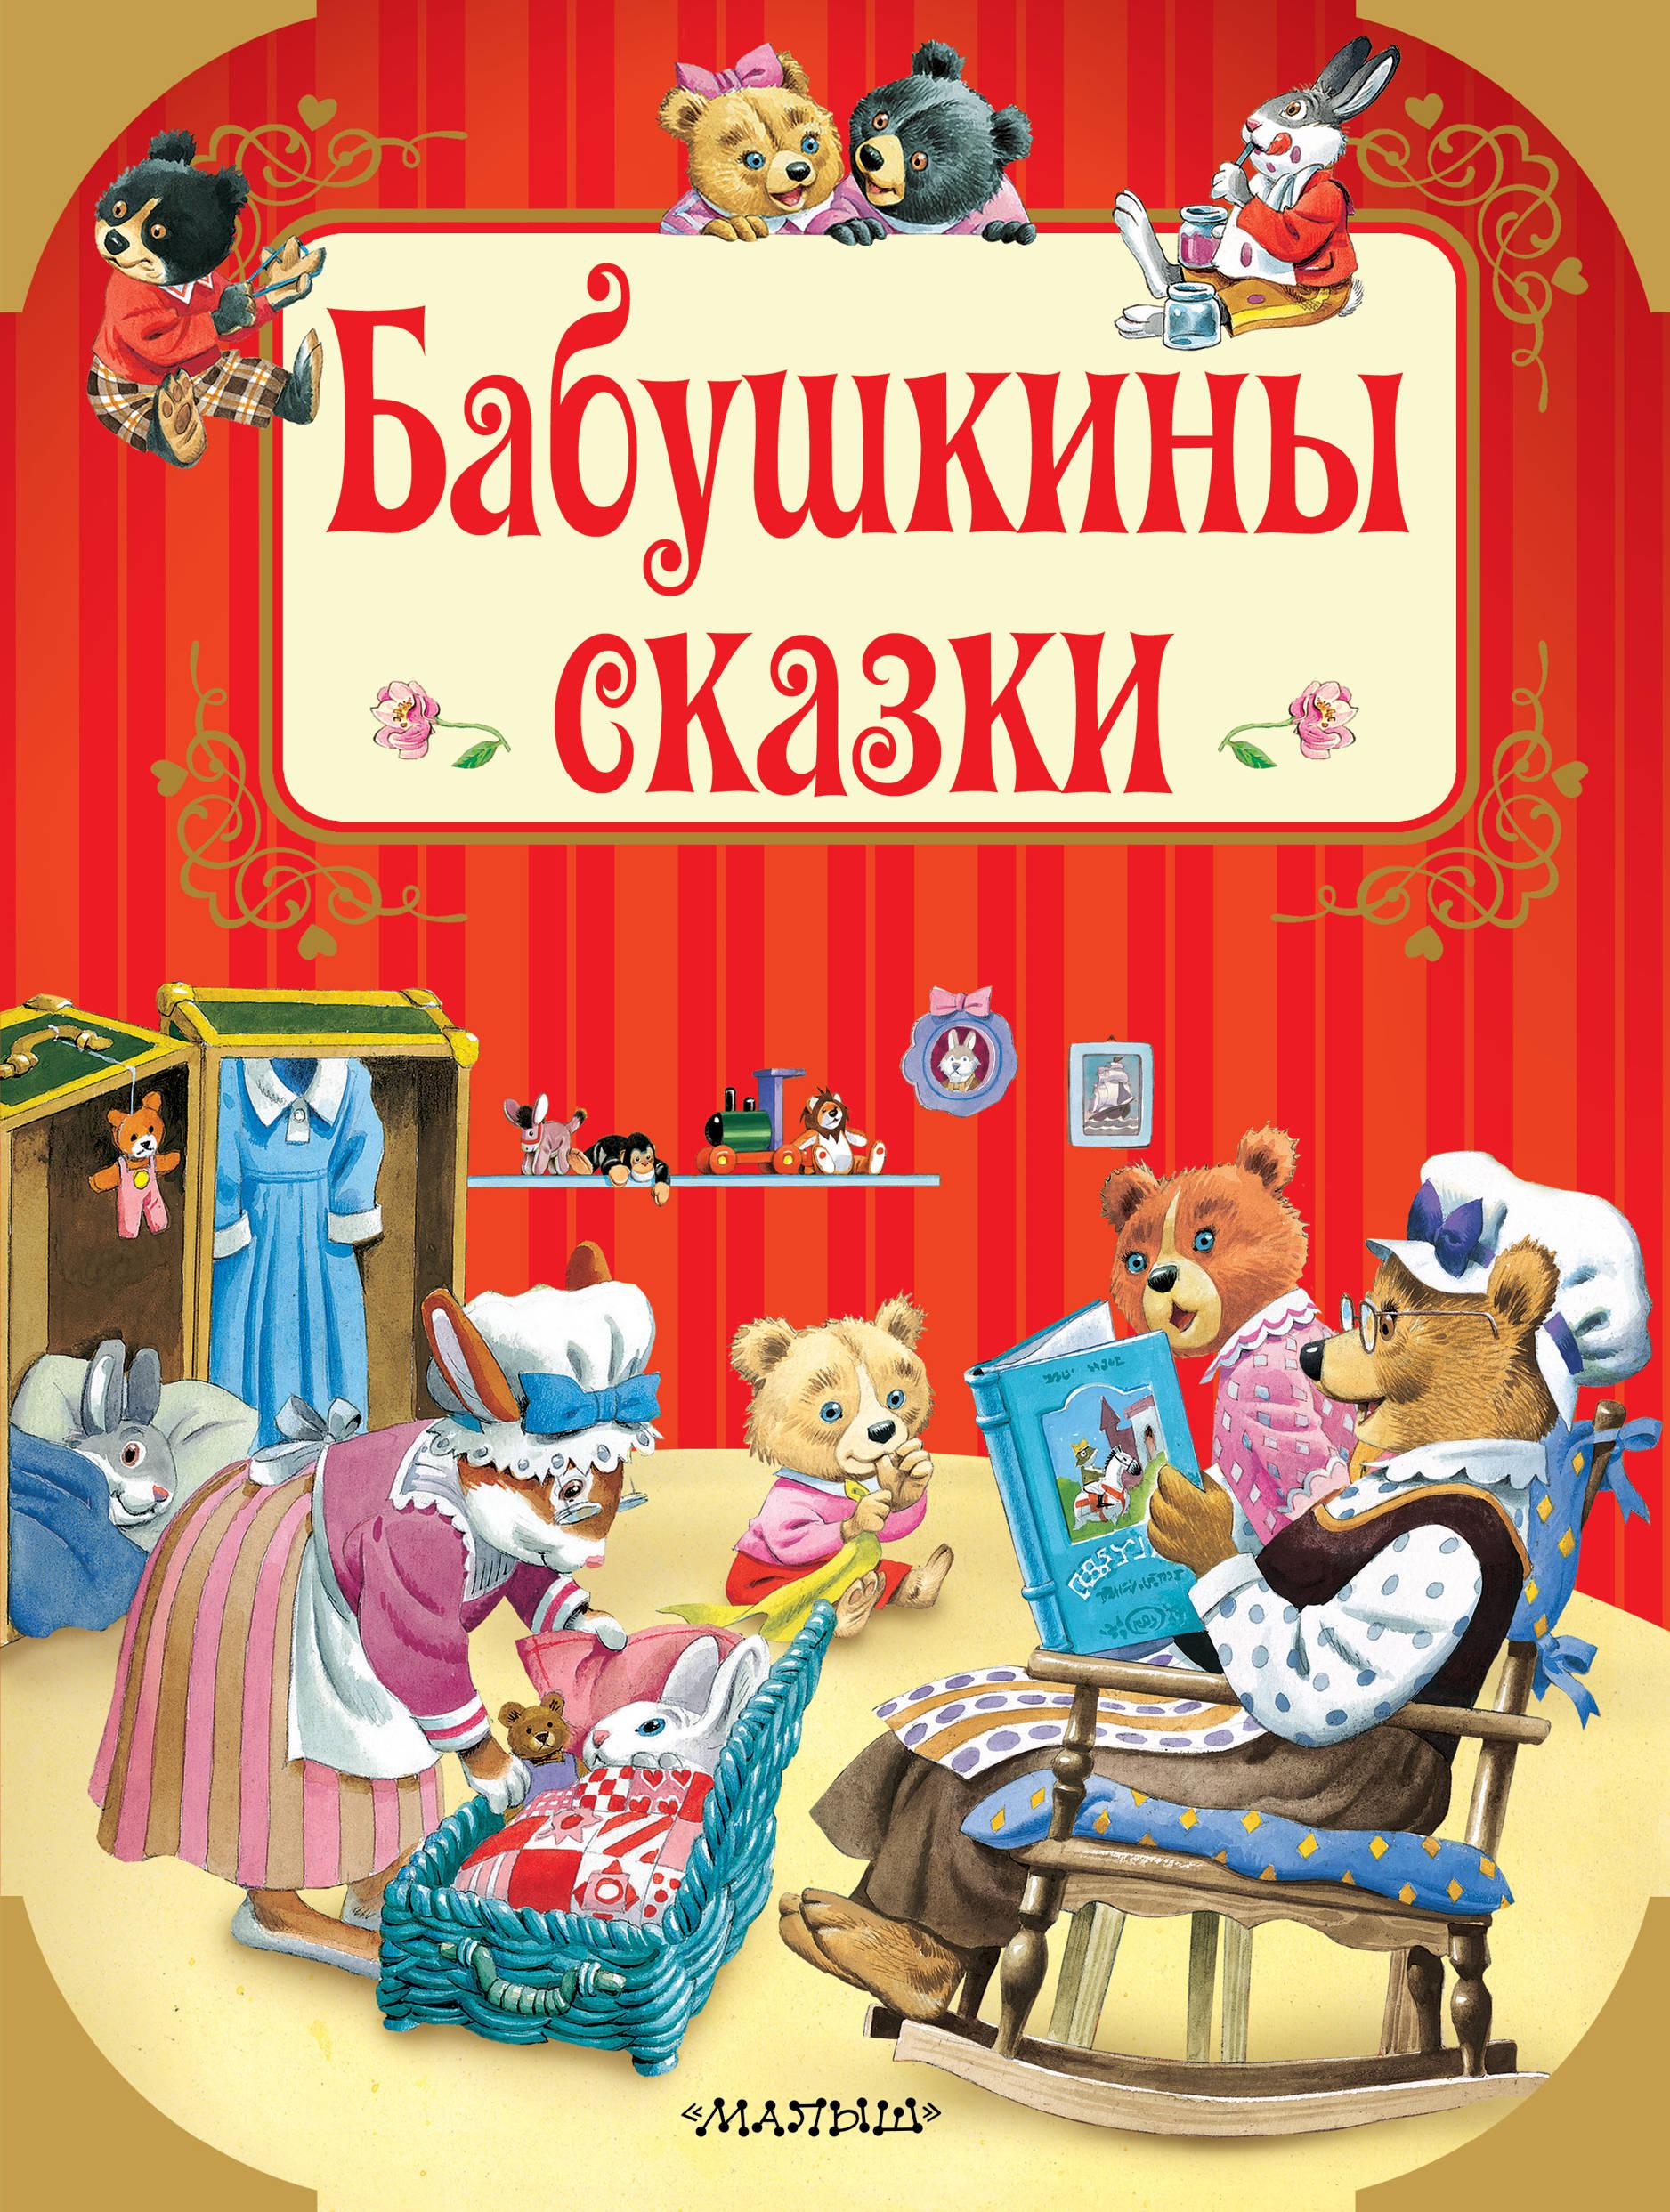 Бабушкины сказки киселева п пер бабушкины сказки